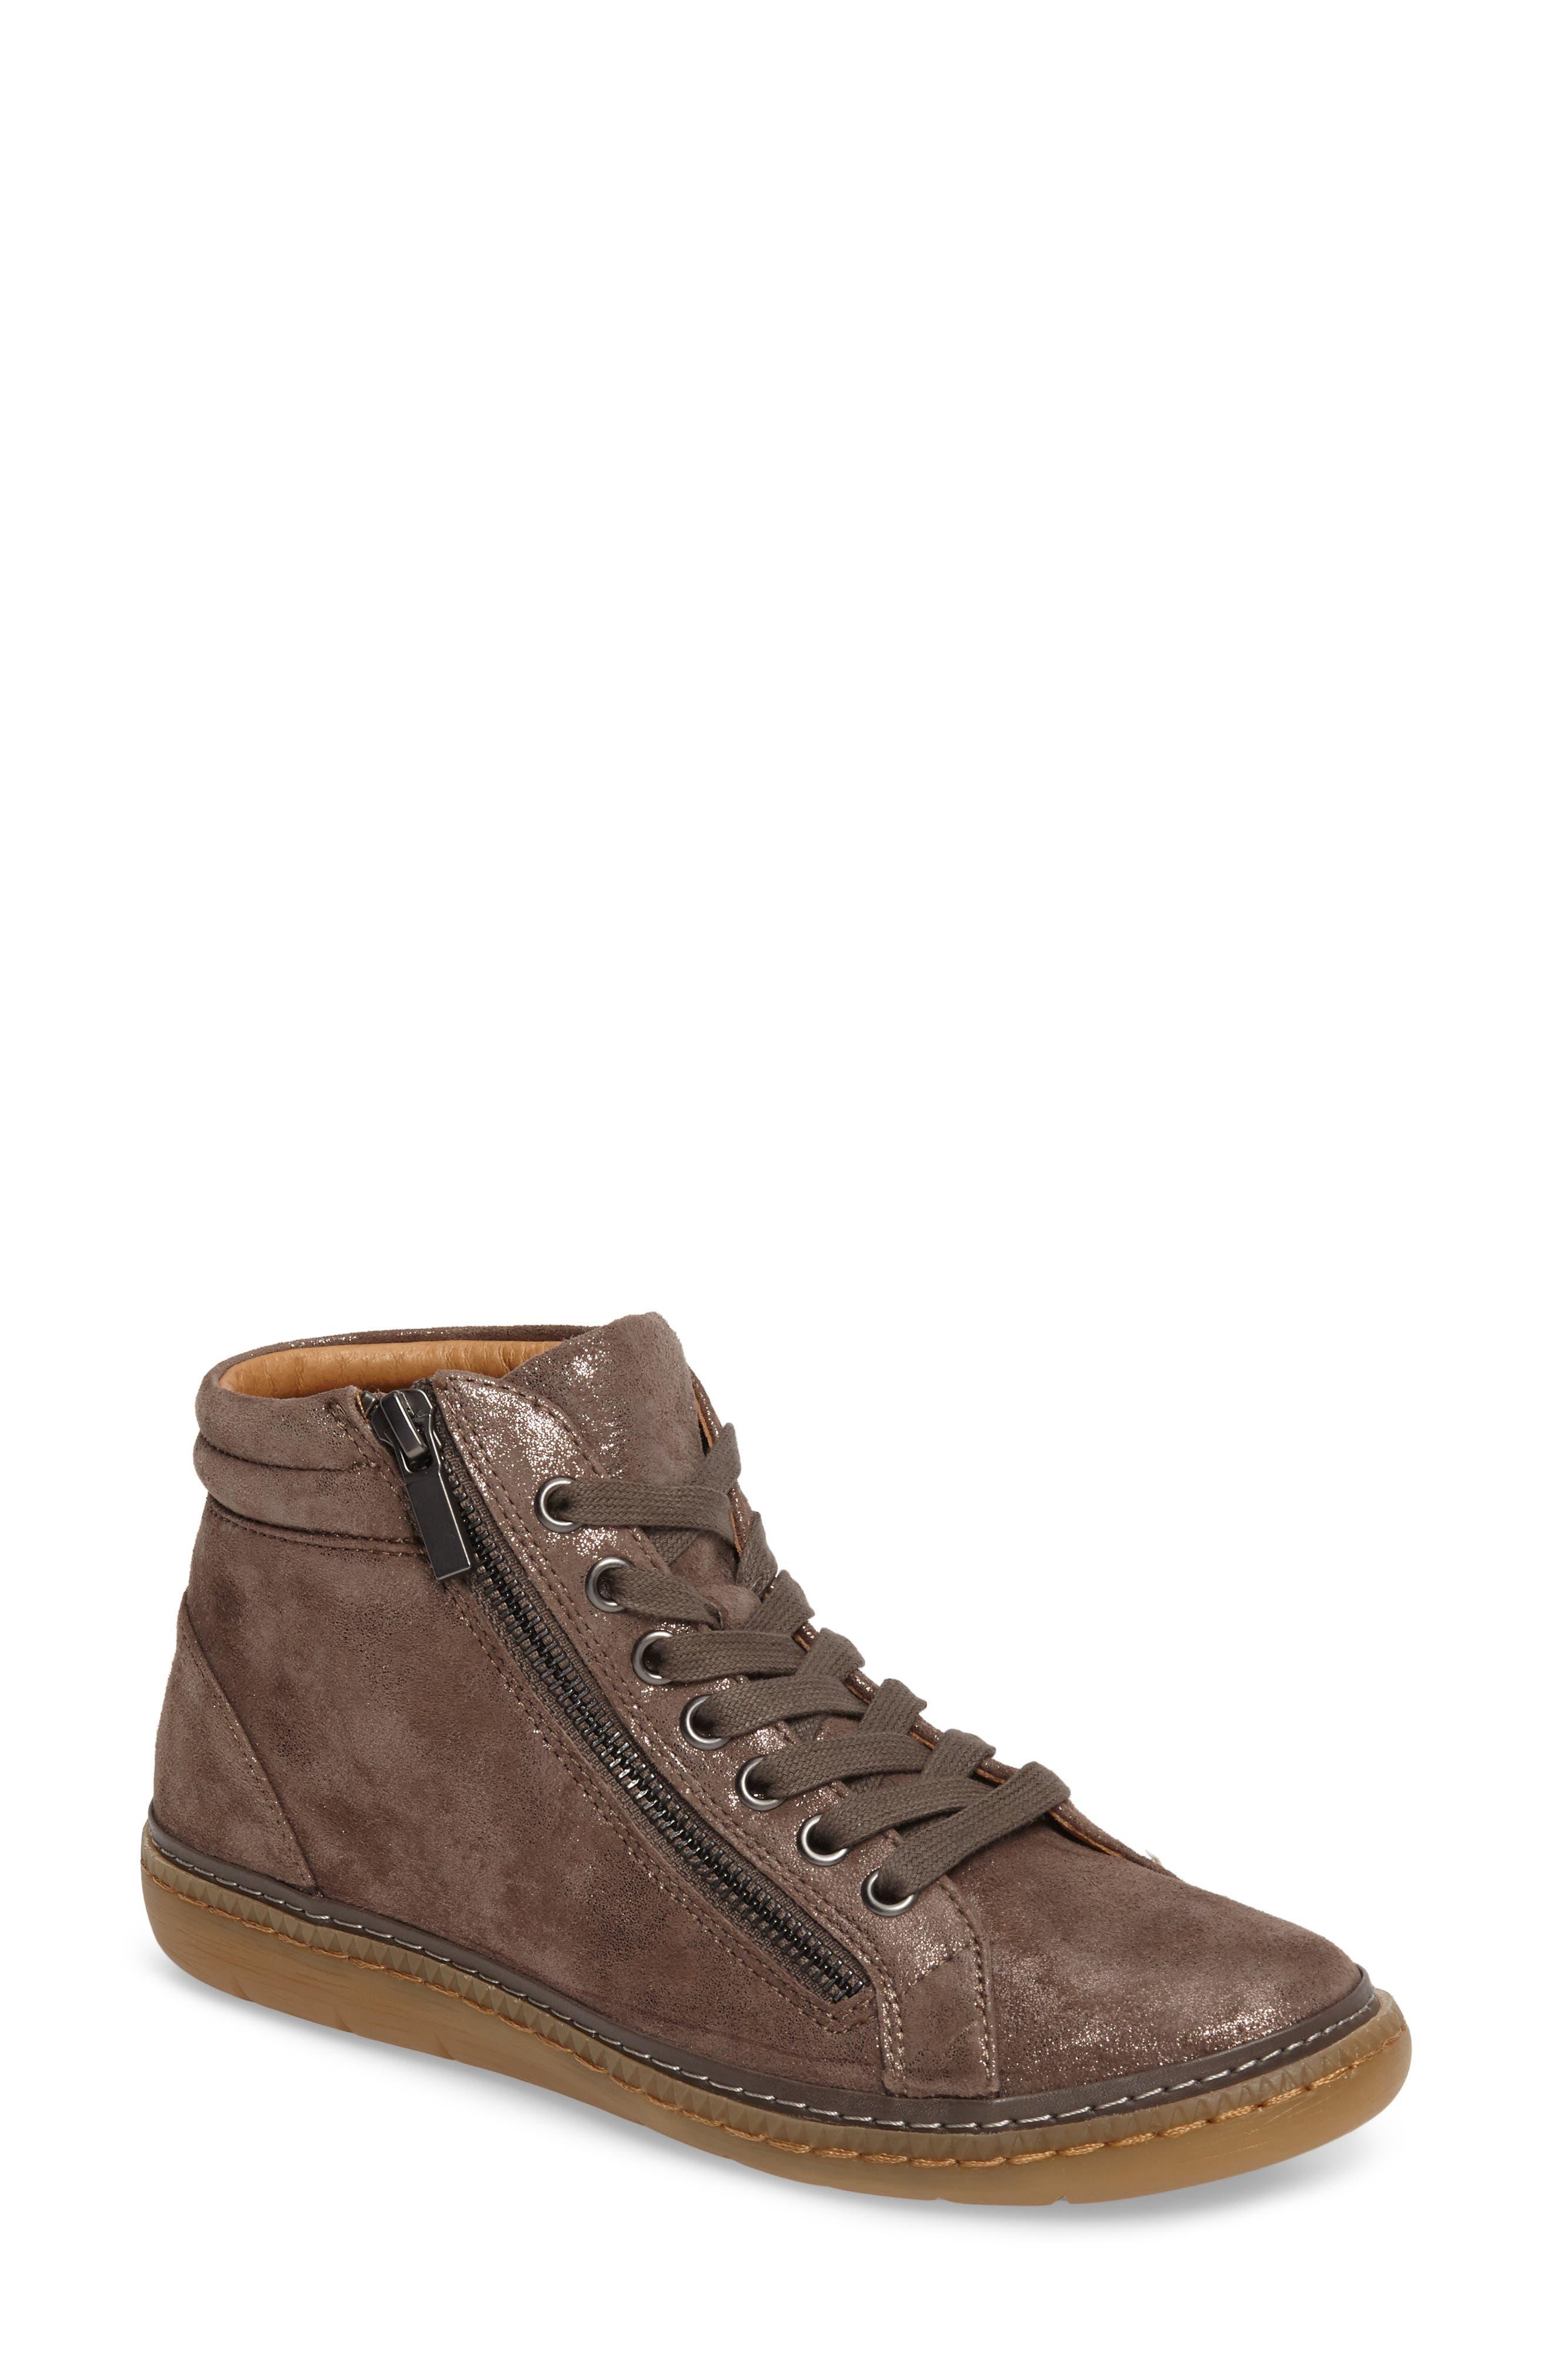 SÖFFT Annaleigh High Top Sneaker, Main, color, SMOKE FOIL SUEDE